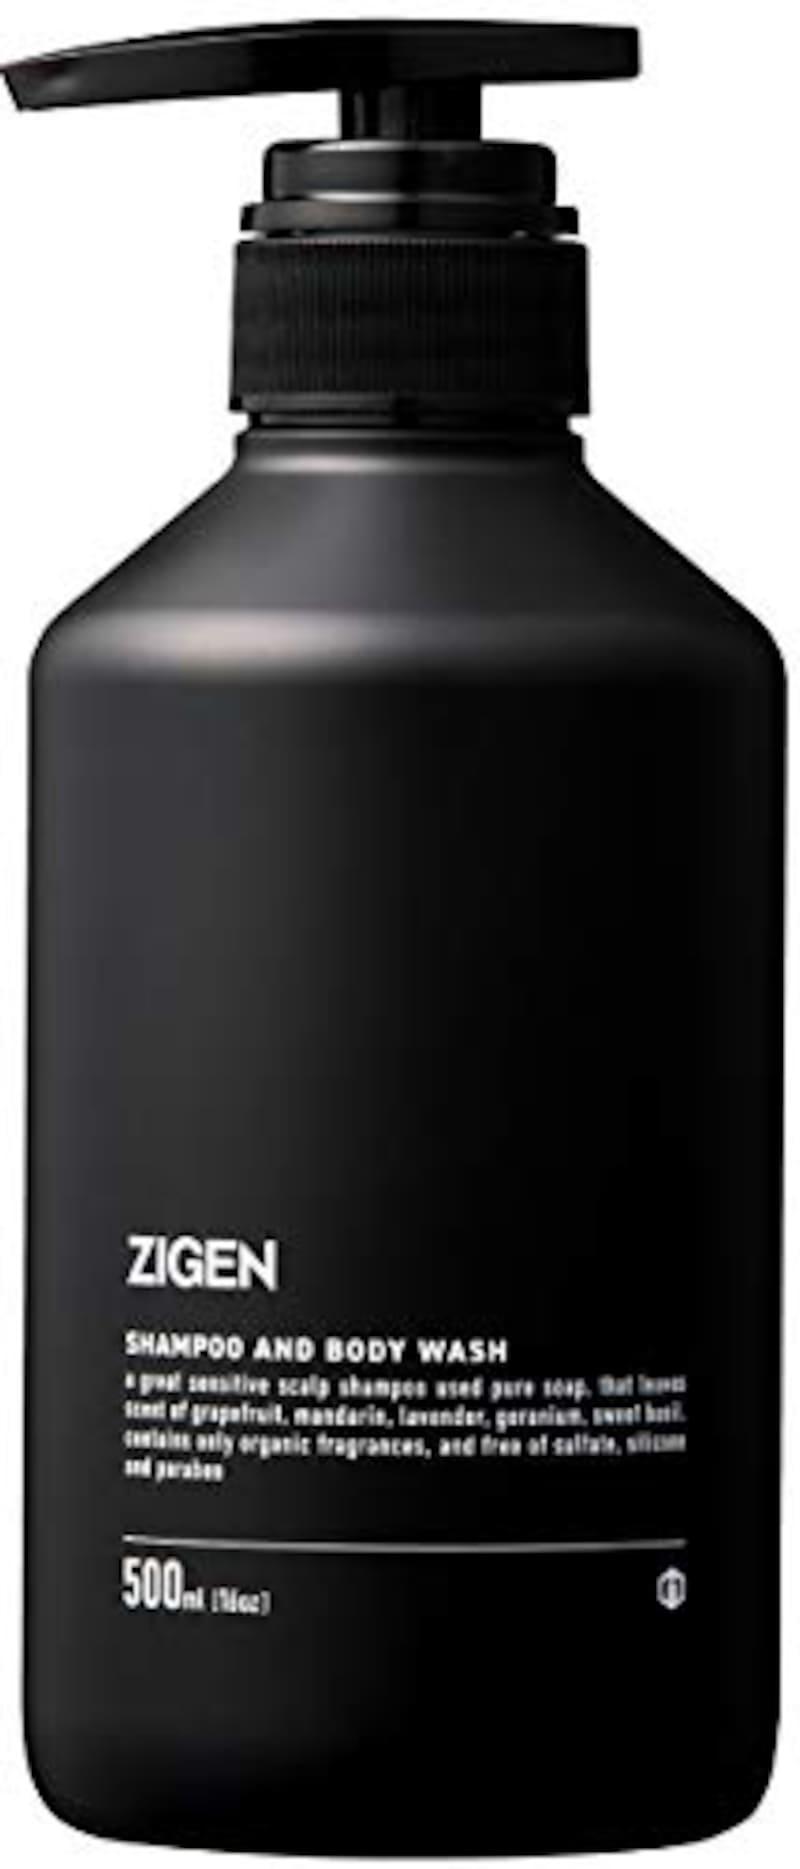 ZIGEN(ジゲン),純石けん 全身シャンプー